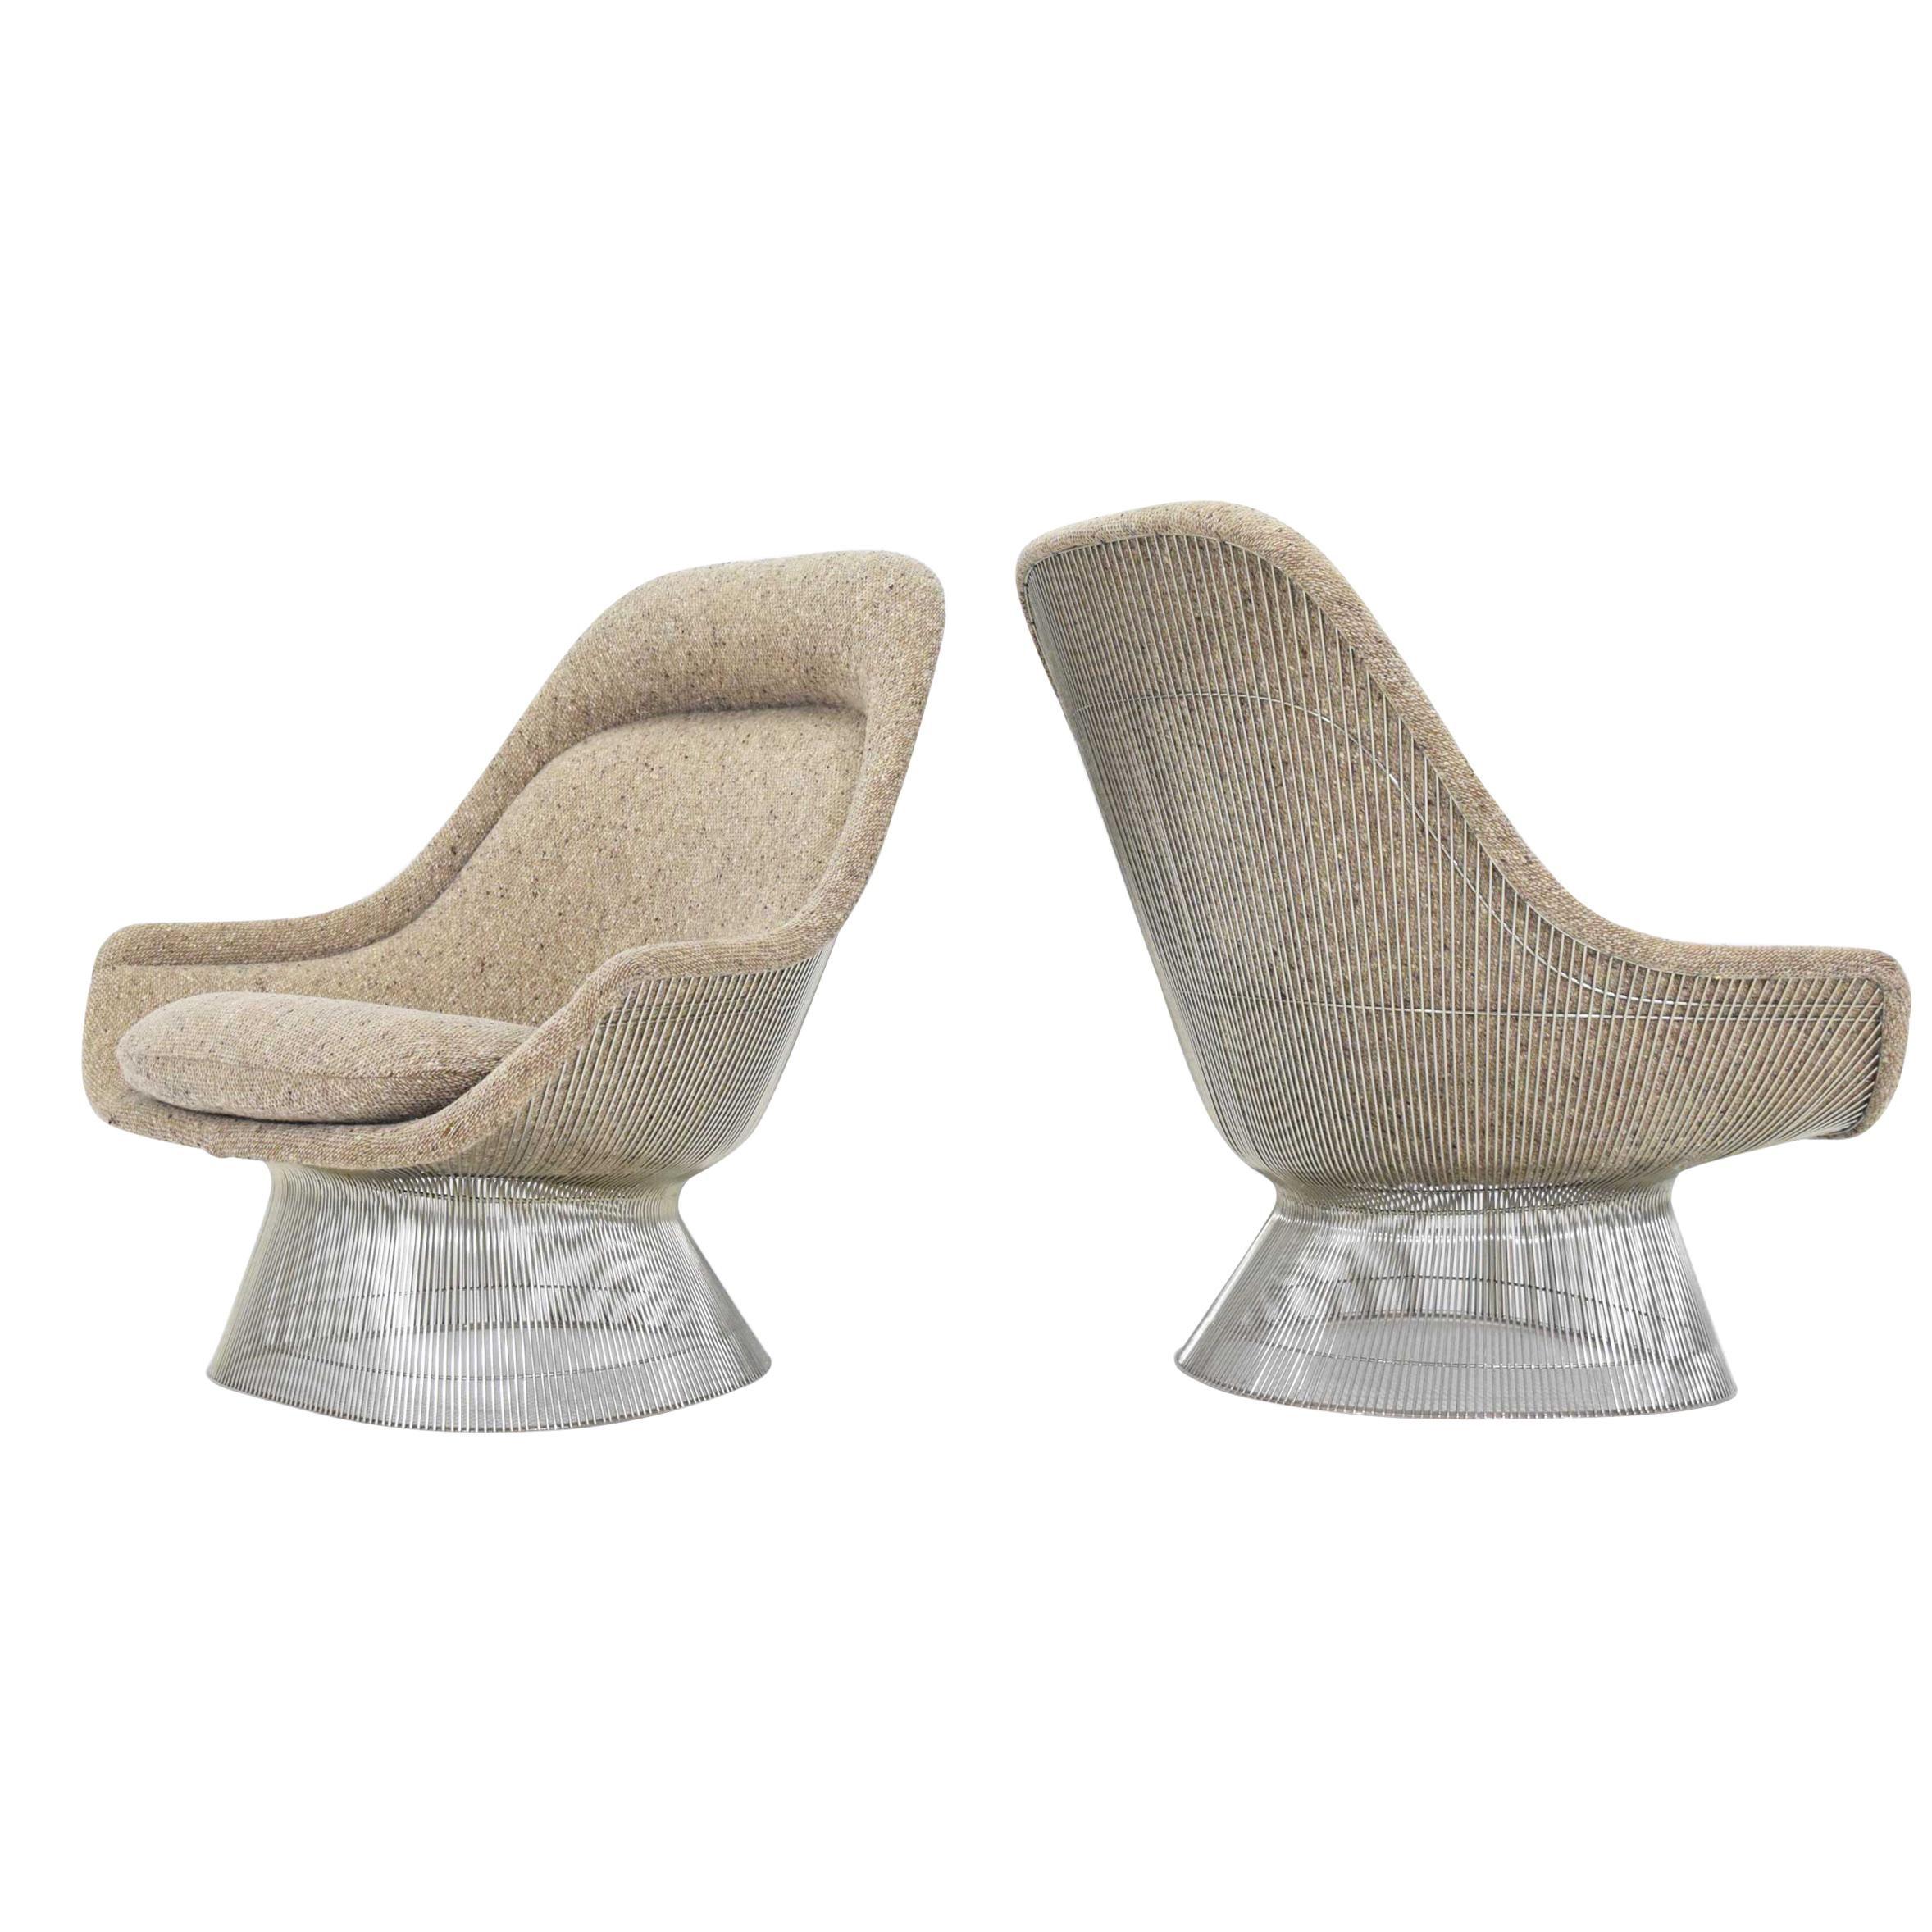 Warren Platner for Knoll Lounge Chairs in Beige Tan Wool Tweed, 1980s